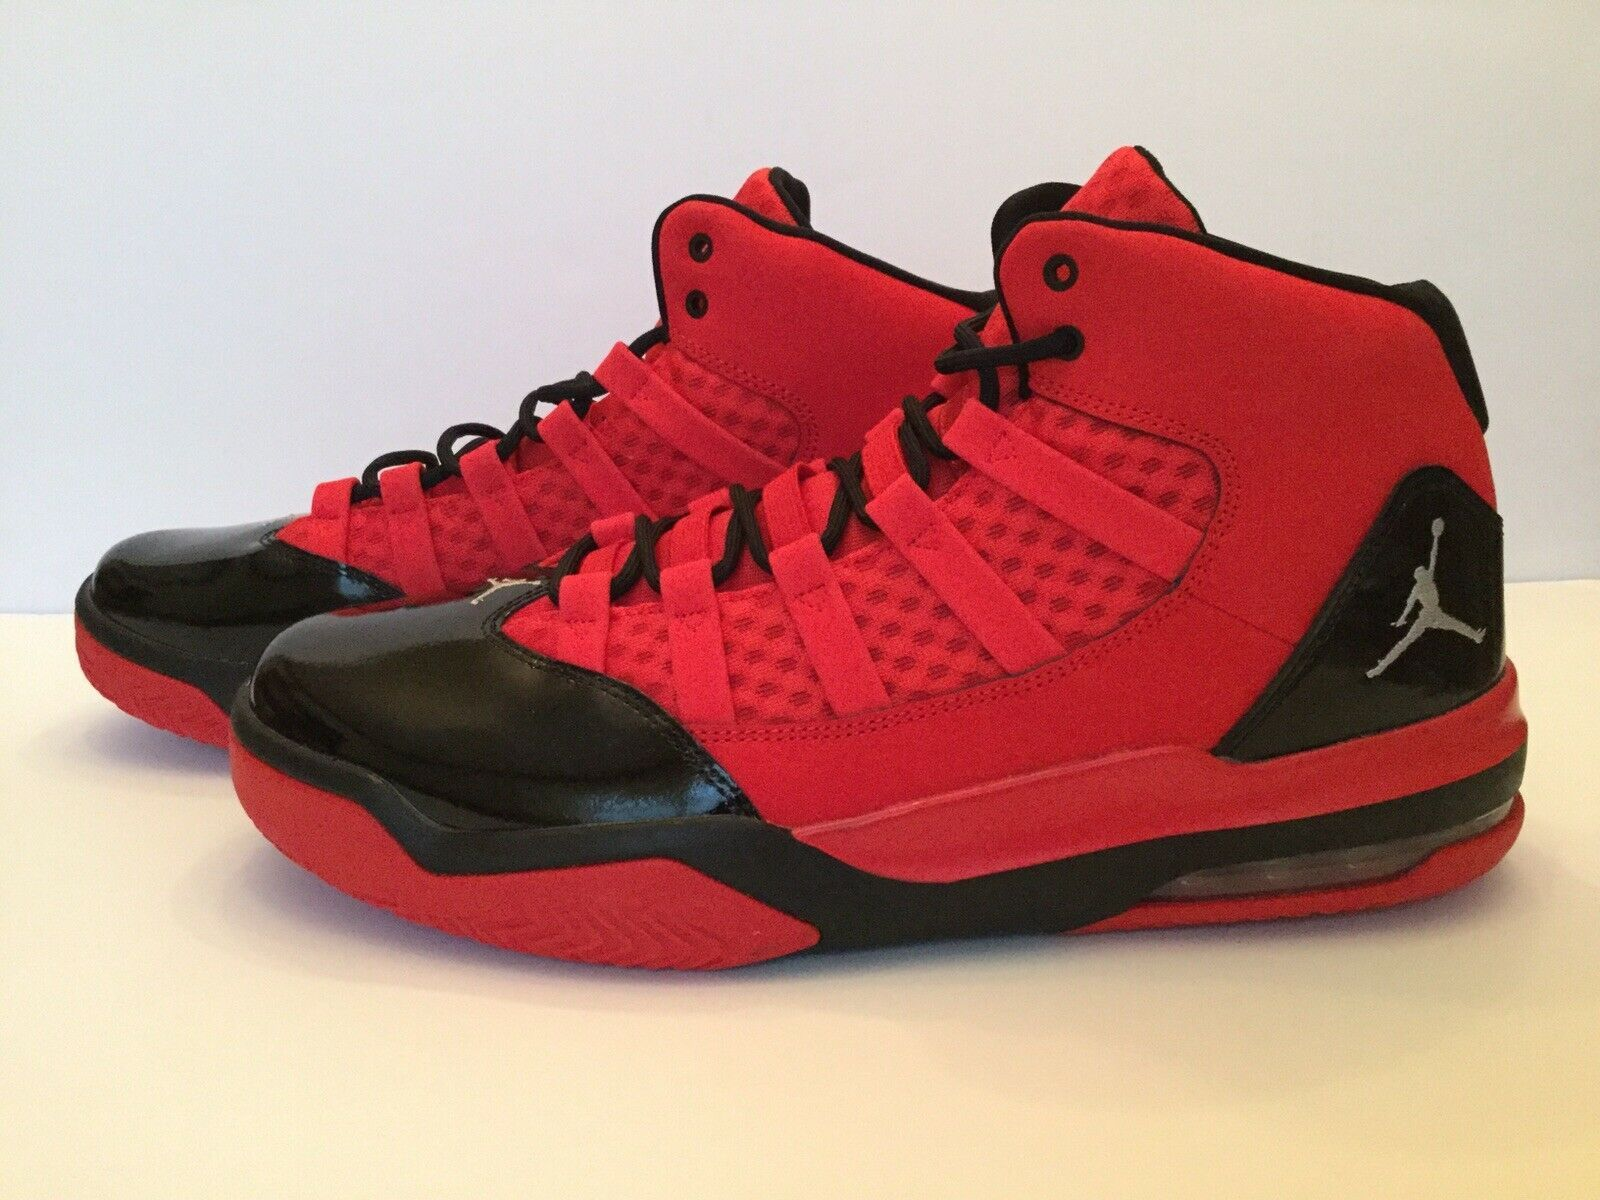 Nike Air Jordan Max Aura Basketball